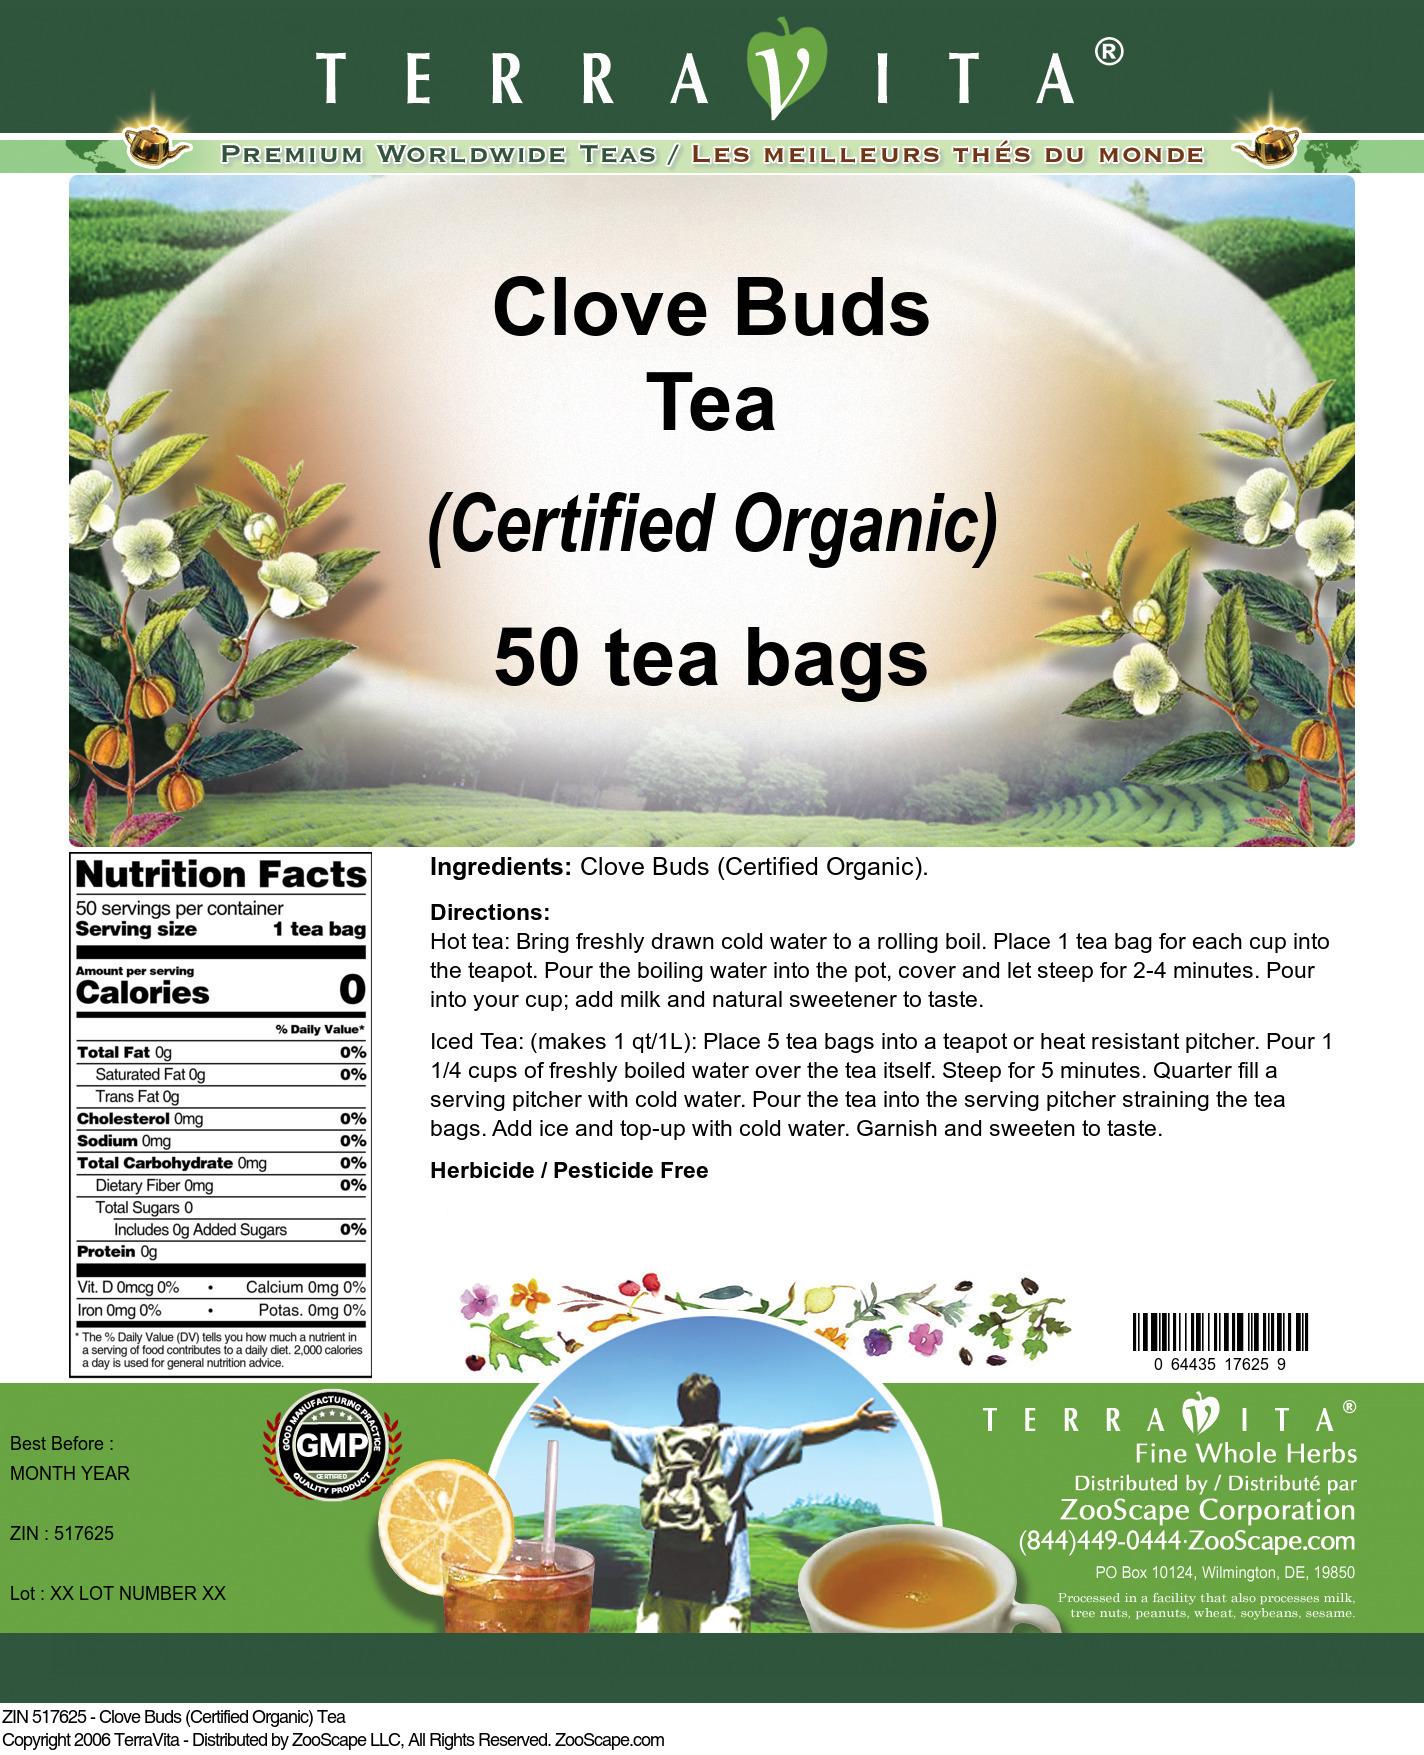 Clove Buds (Certified Organic) Tea